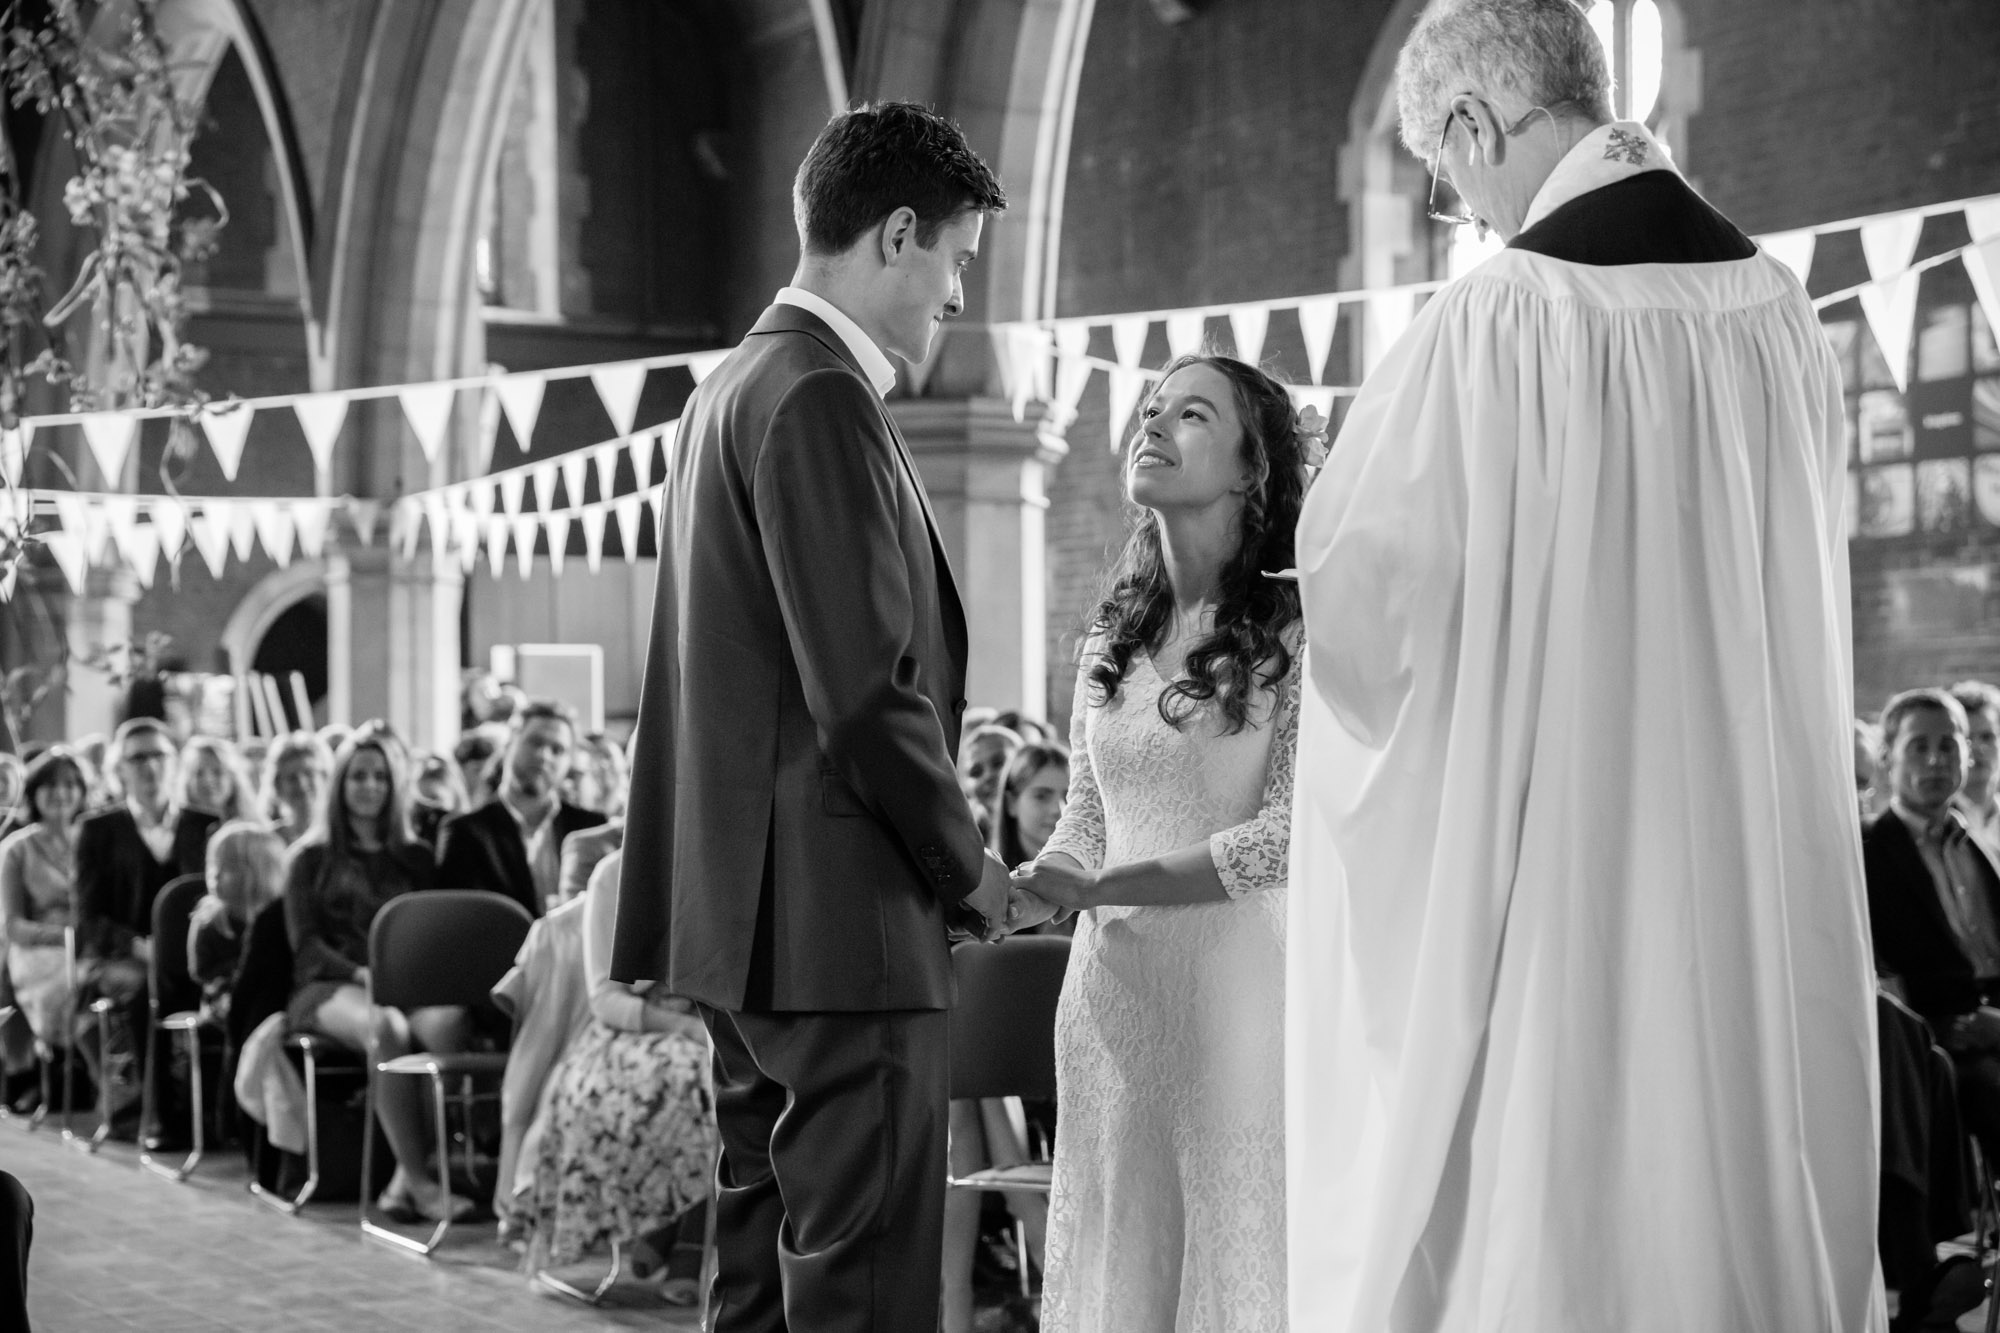 weddings-couples-love-photographer-oxford-london-jonathan-self-photography-32.jpg